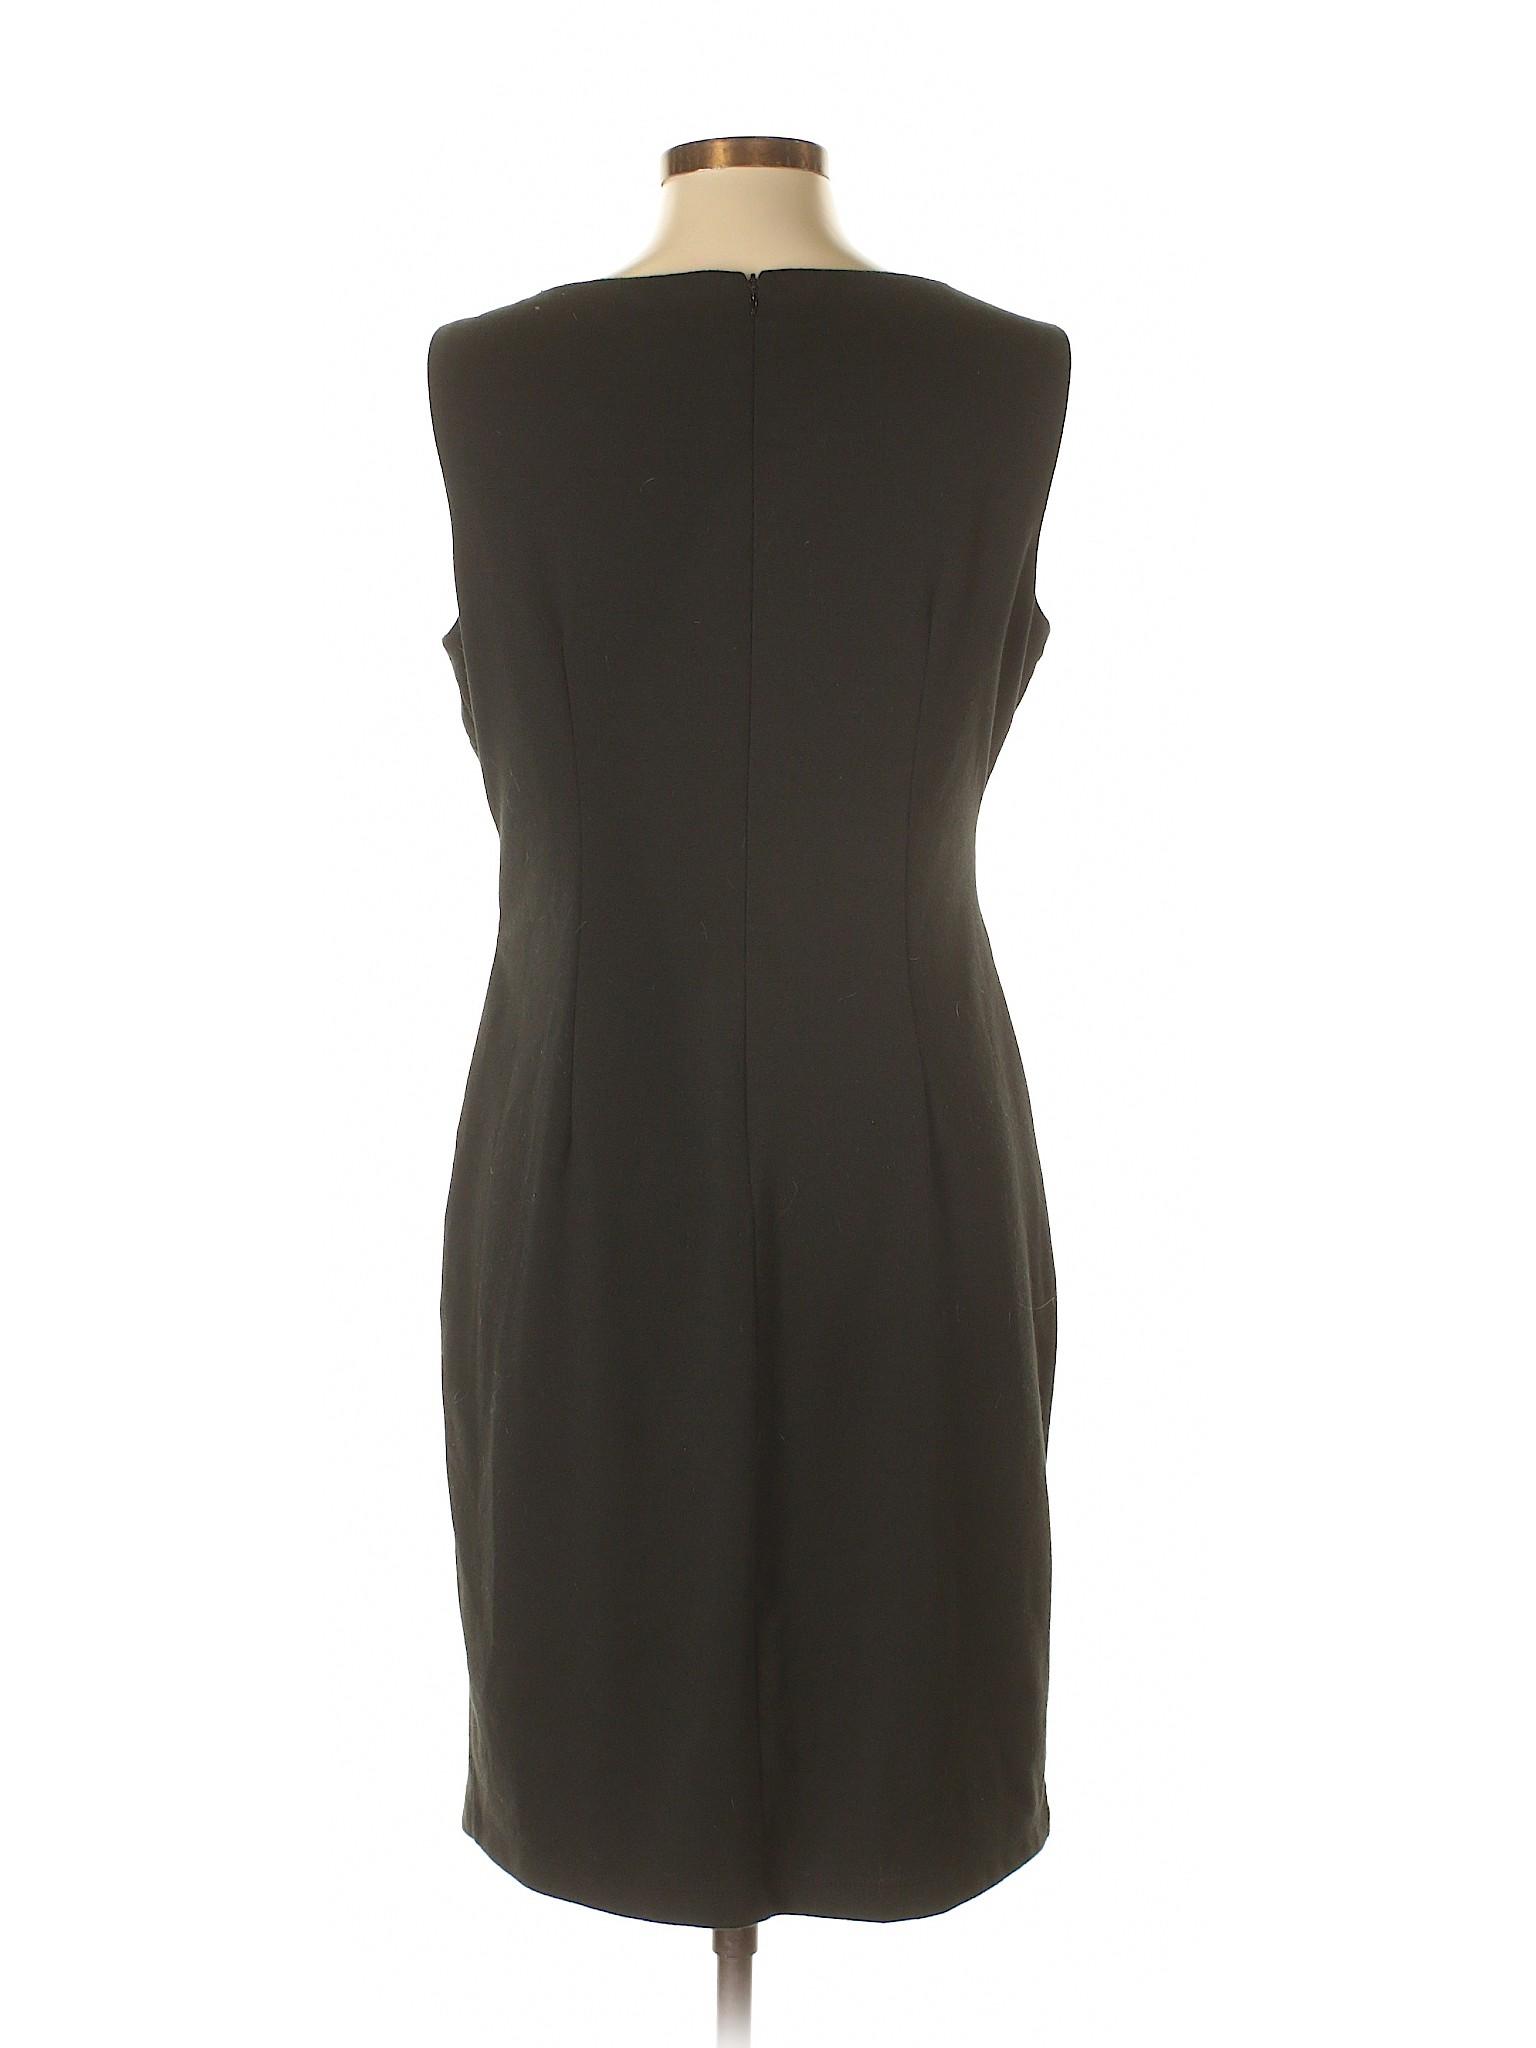 Roz Casual Ali amp; Boutique Dress winter 5n4WxB